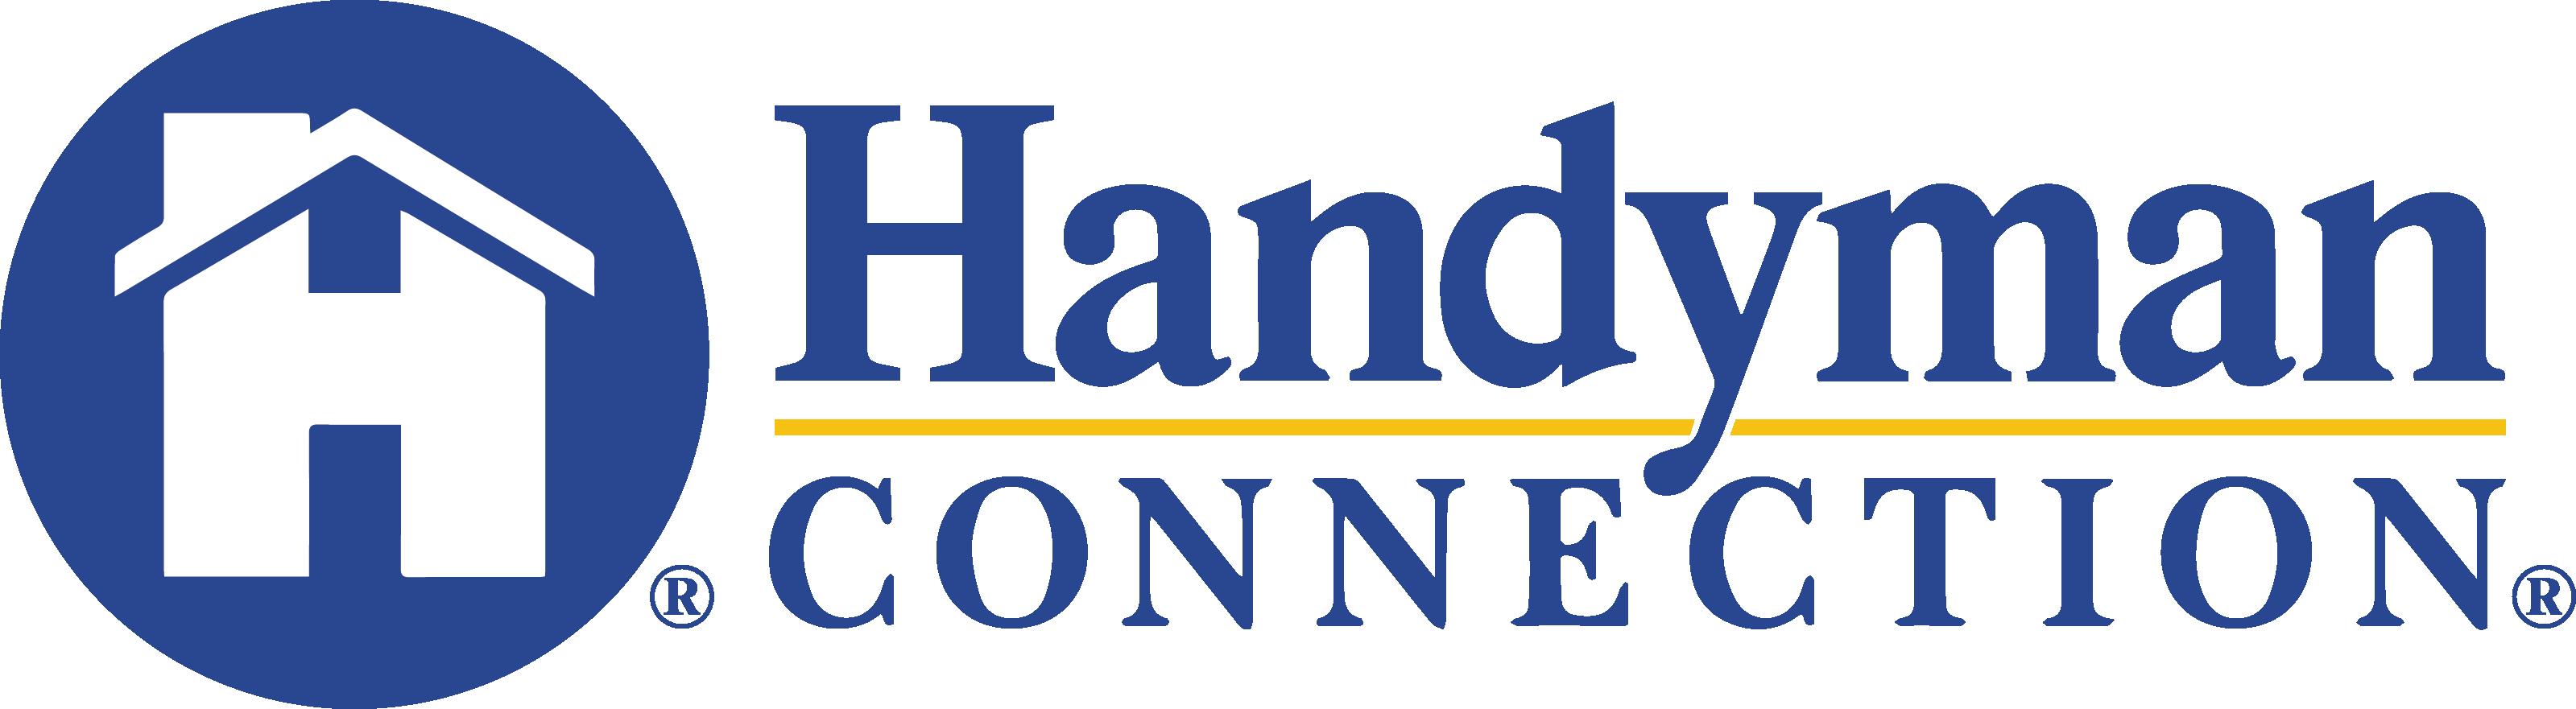 Handyman Connection of Victoria